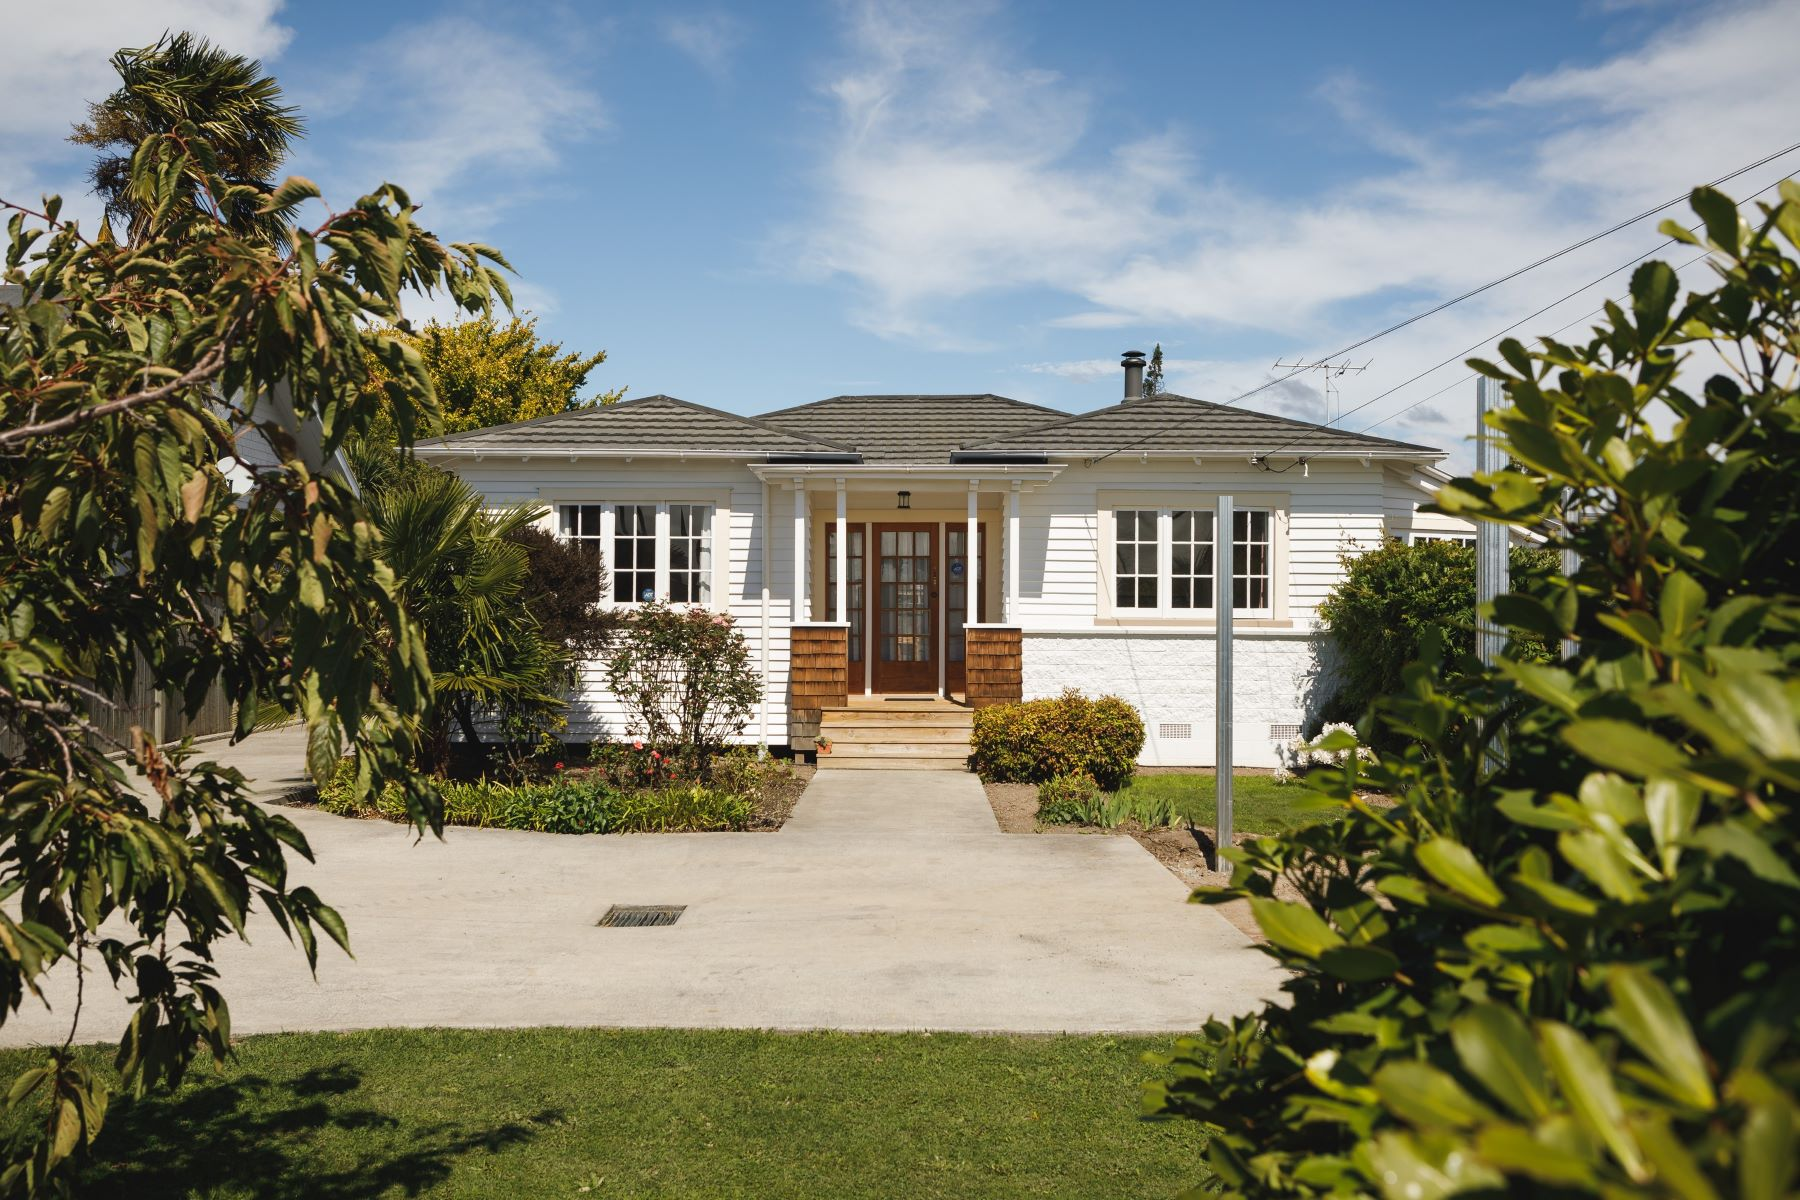 Villa per Vendita alle ore 47 George Street Blenheim, Marlborough, 7201 Nuova Zelanda